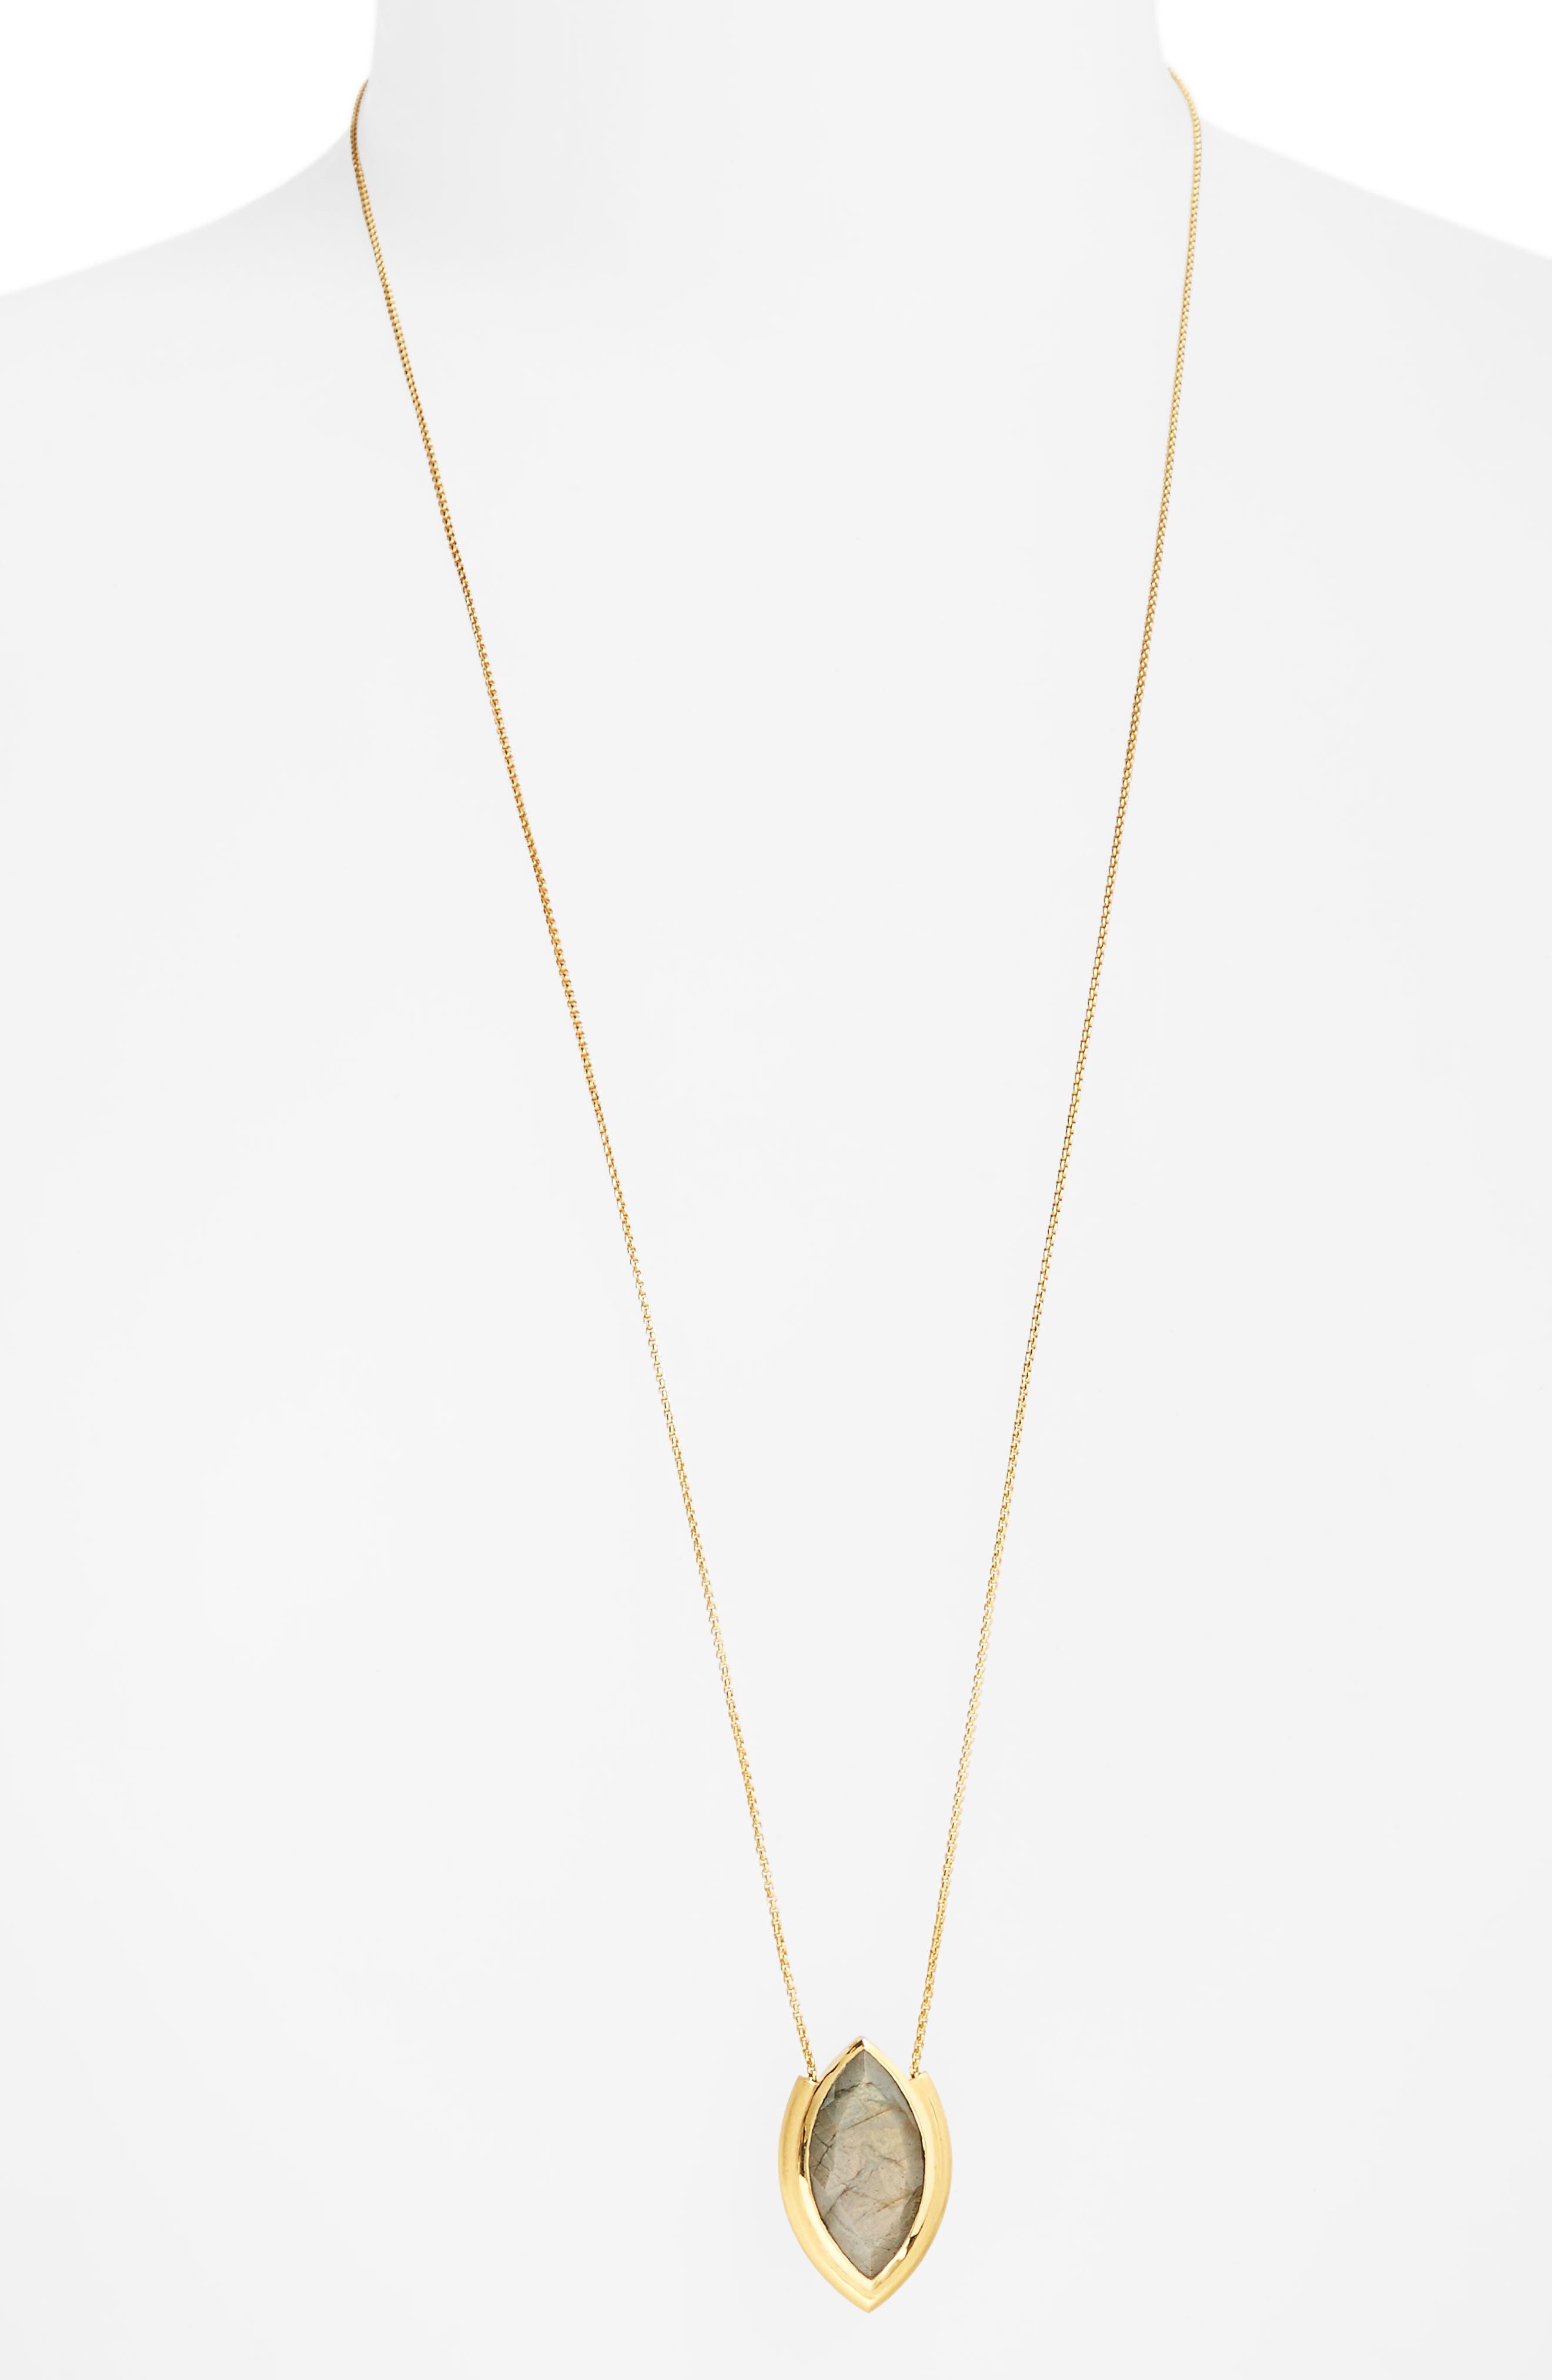 Lotus Pendant Necklace,                             Main thumbnail 1, color,                             Labradorite/ Gold